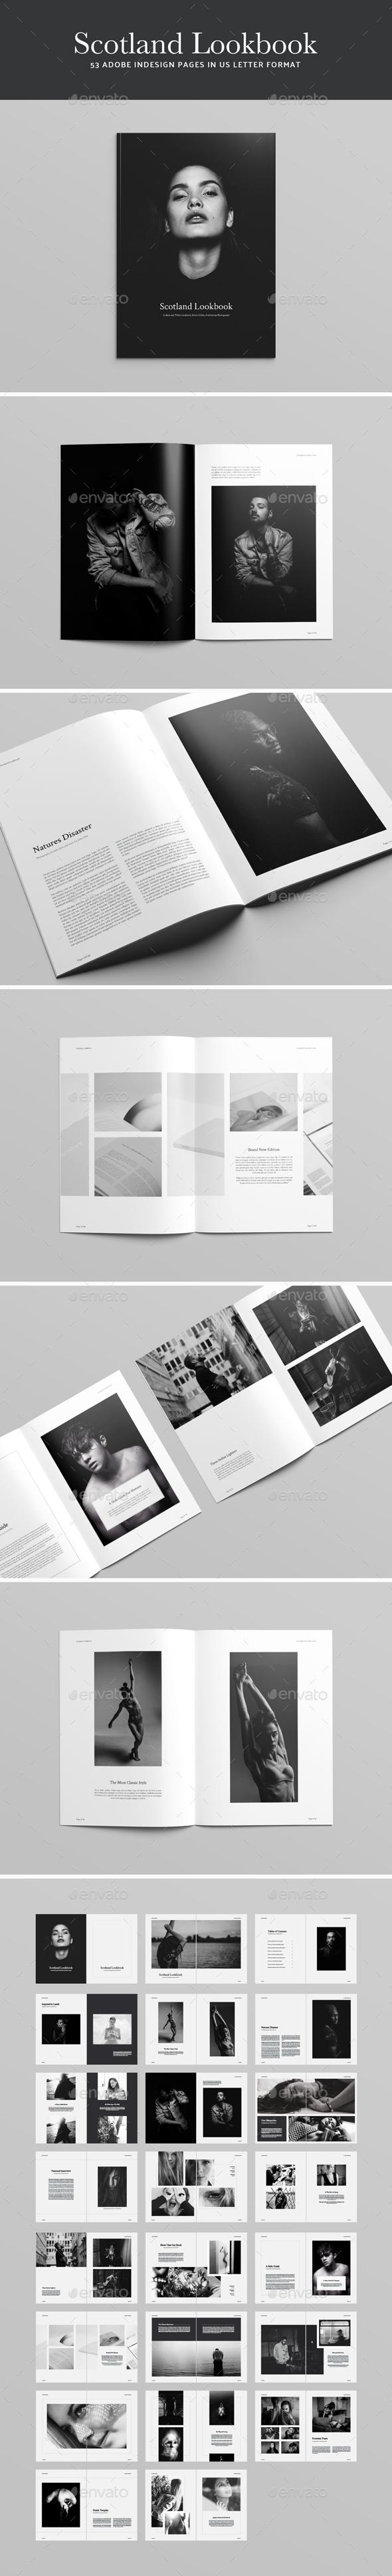 Scotland Lookbook - Magazines Print Templates